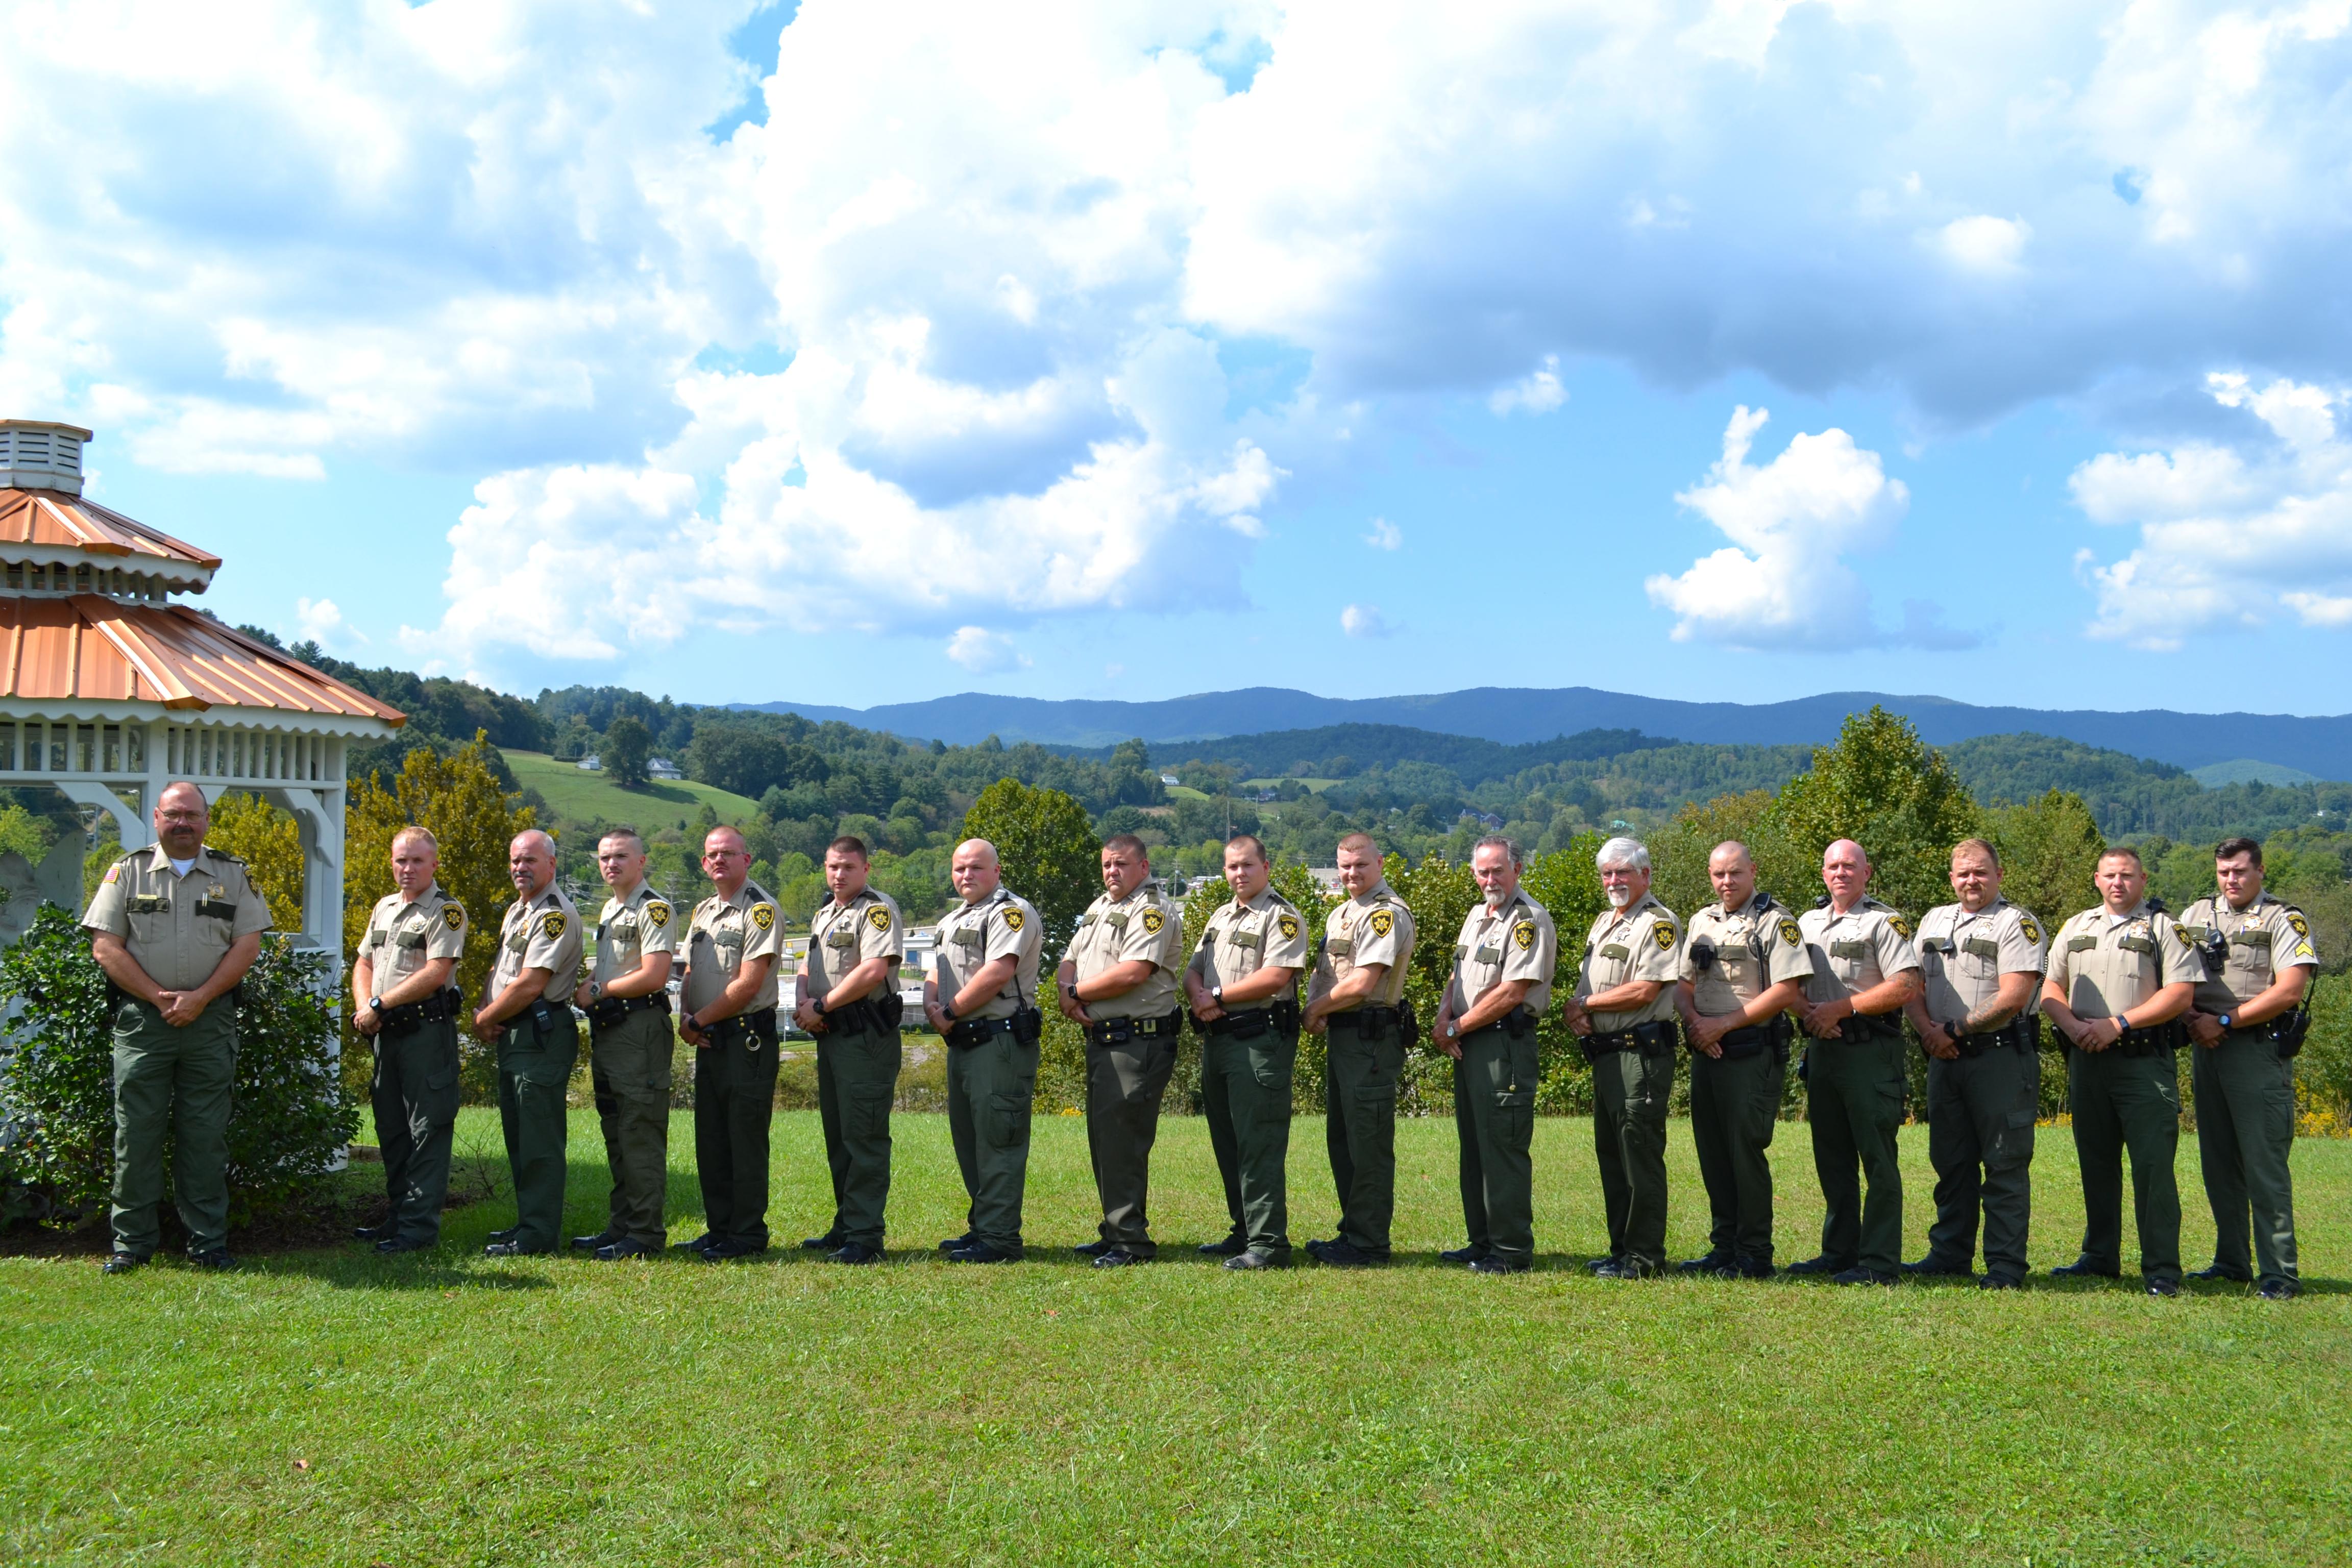 Johnson County Sheriff's Department – Mountain City